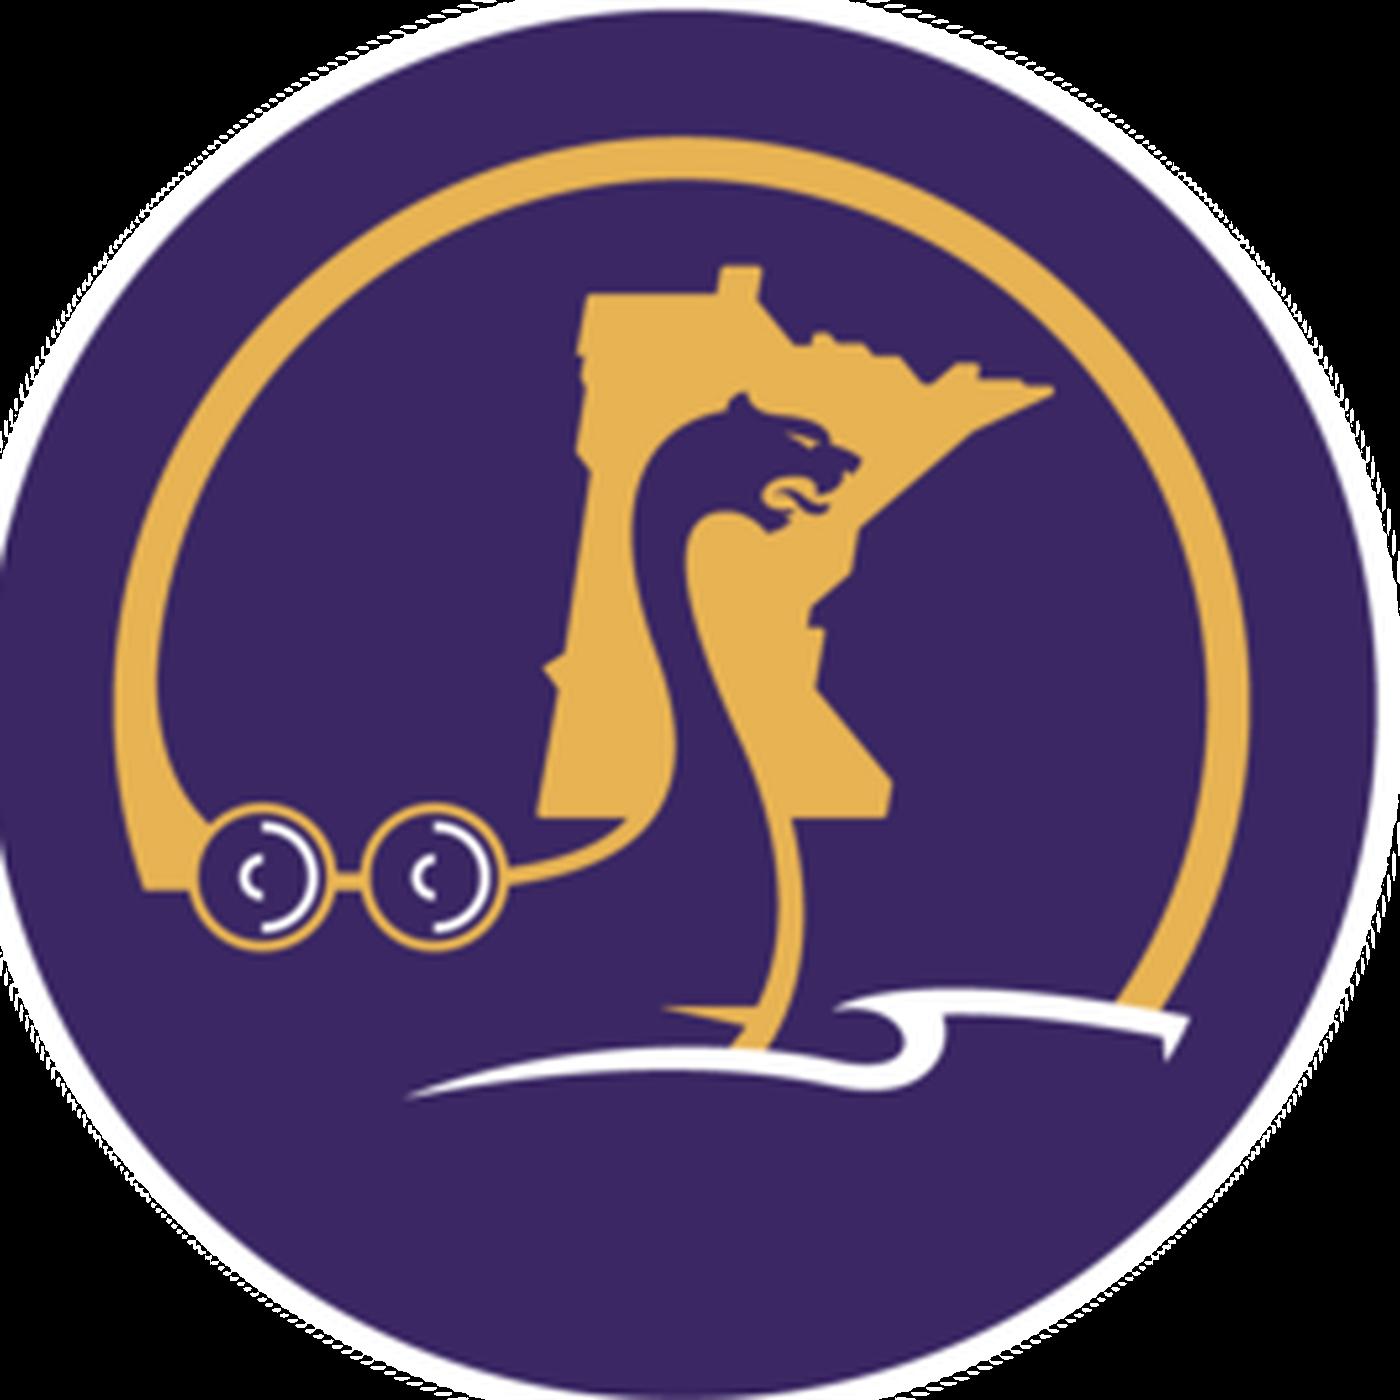 Vikings Twitter Emoji - Daily Norseman 8a7656c8d